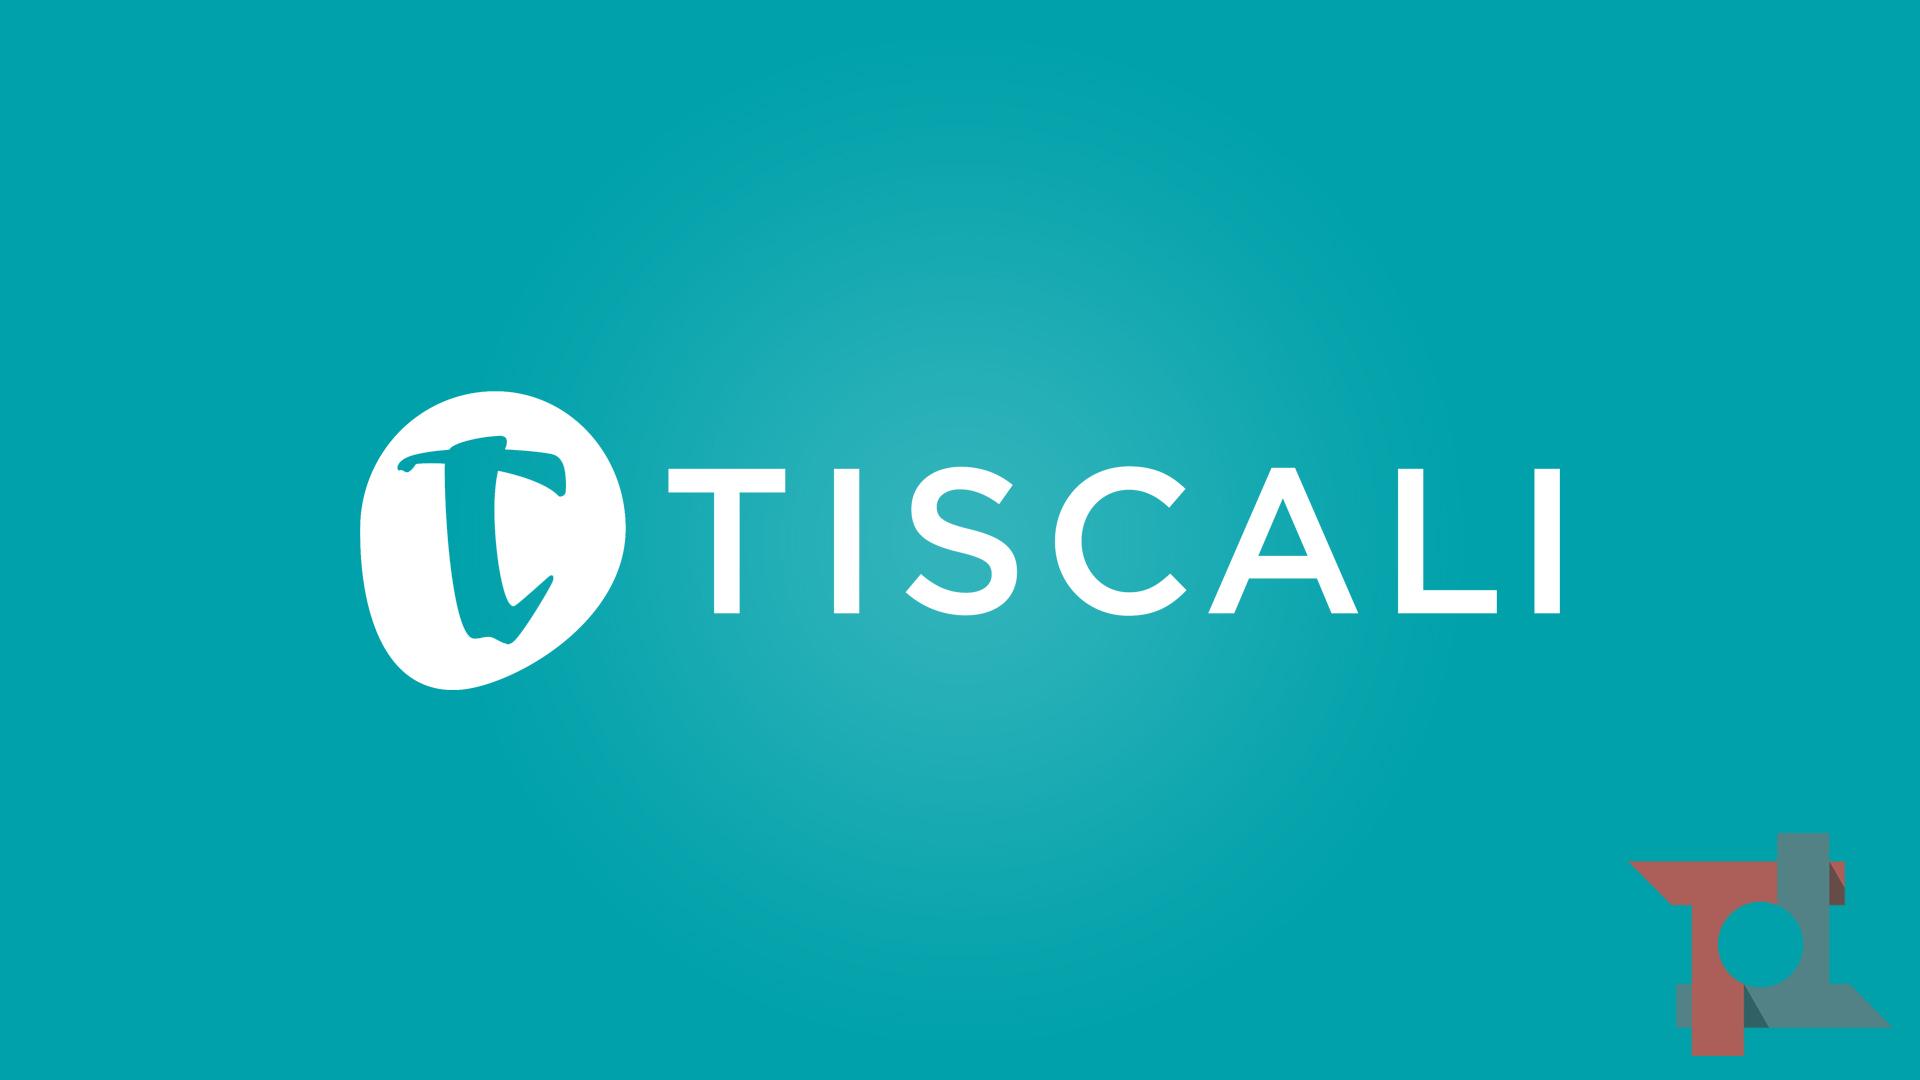 Migliori offerte fibra e ADSL di TIM, Vodafone, Fastweb, WINDTRE e Tiscali 5